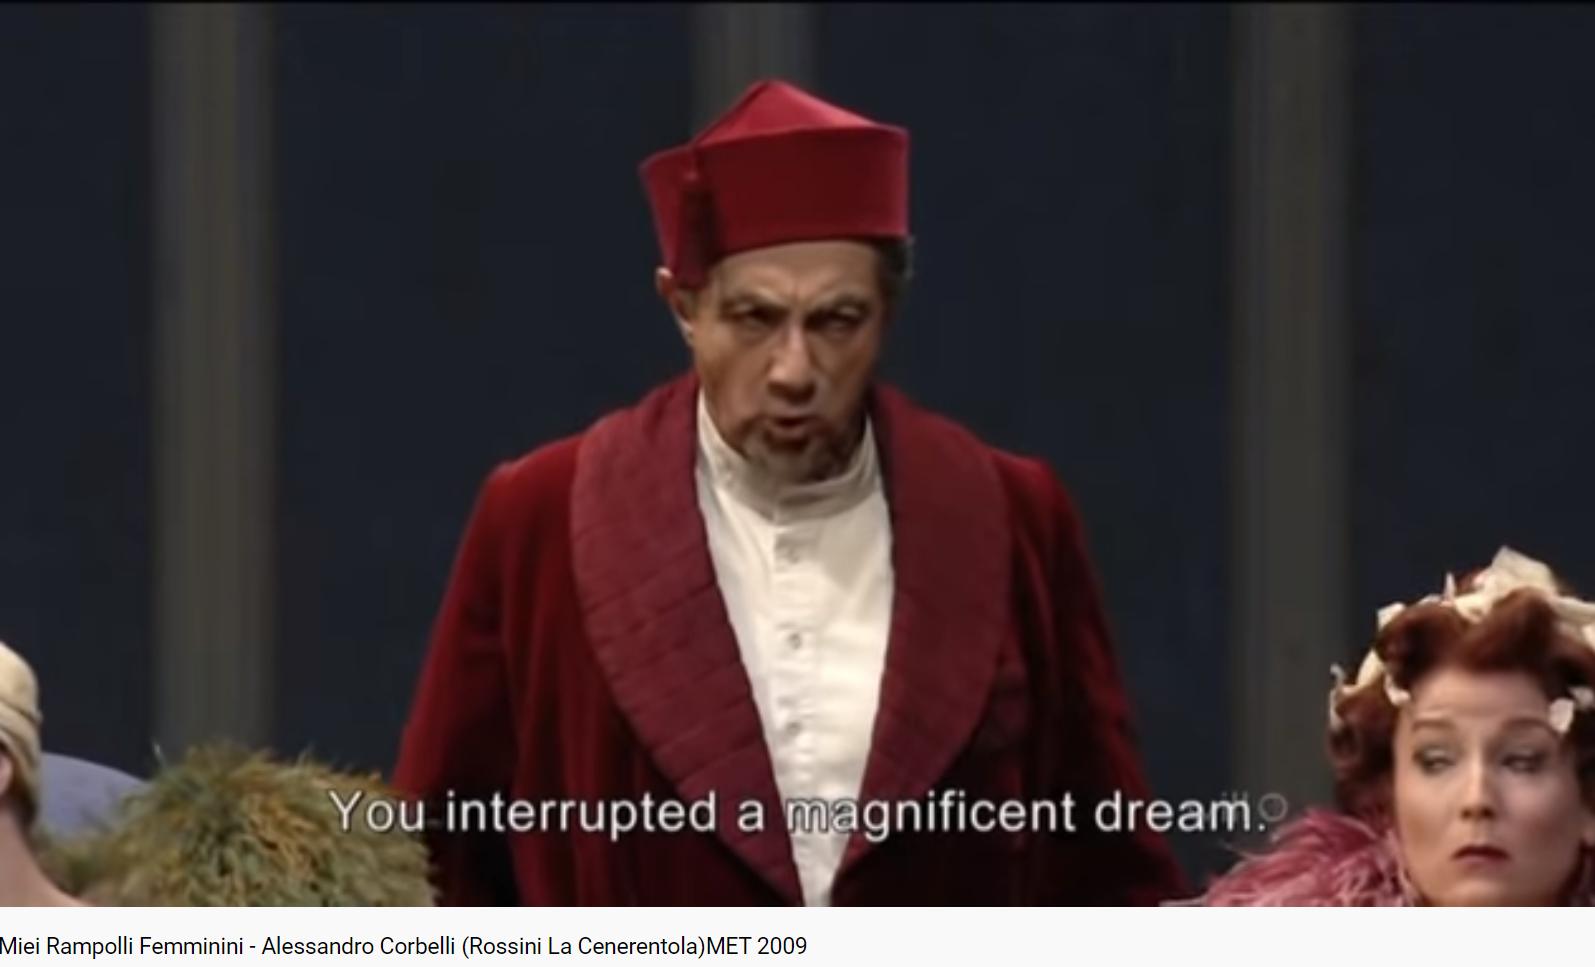 Rossini la Cenerentola miei Rampolli femminini